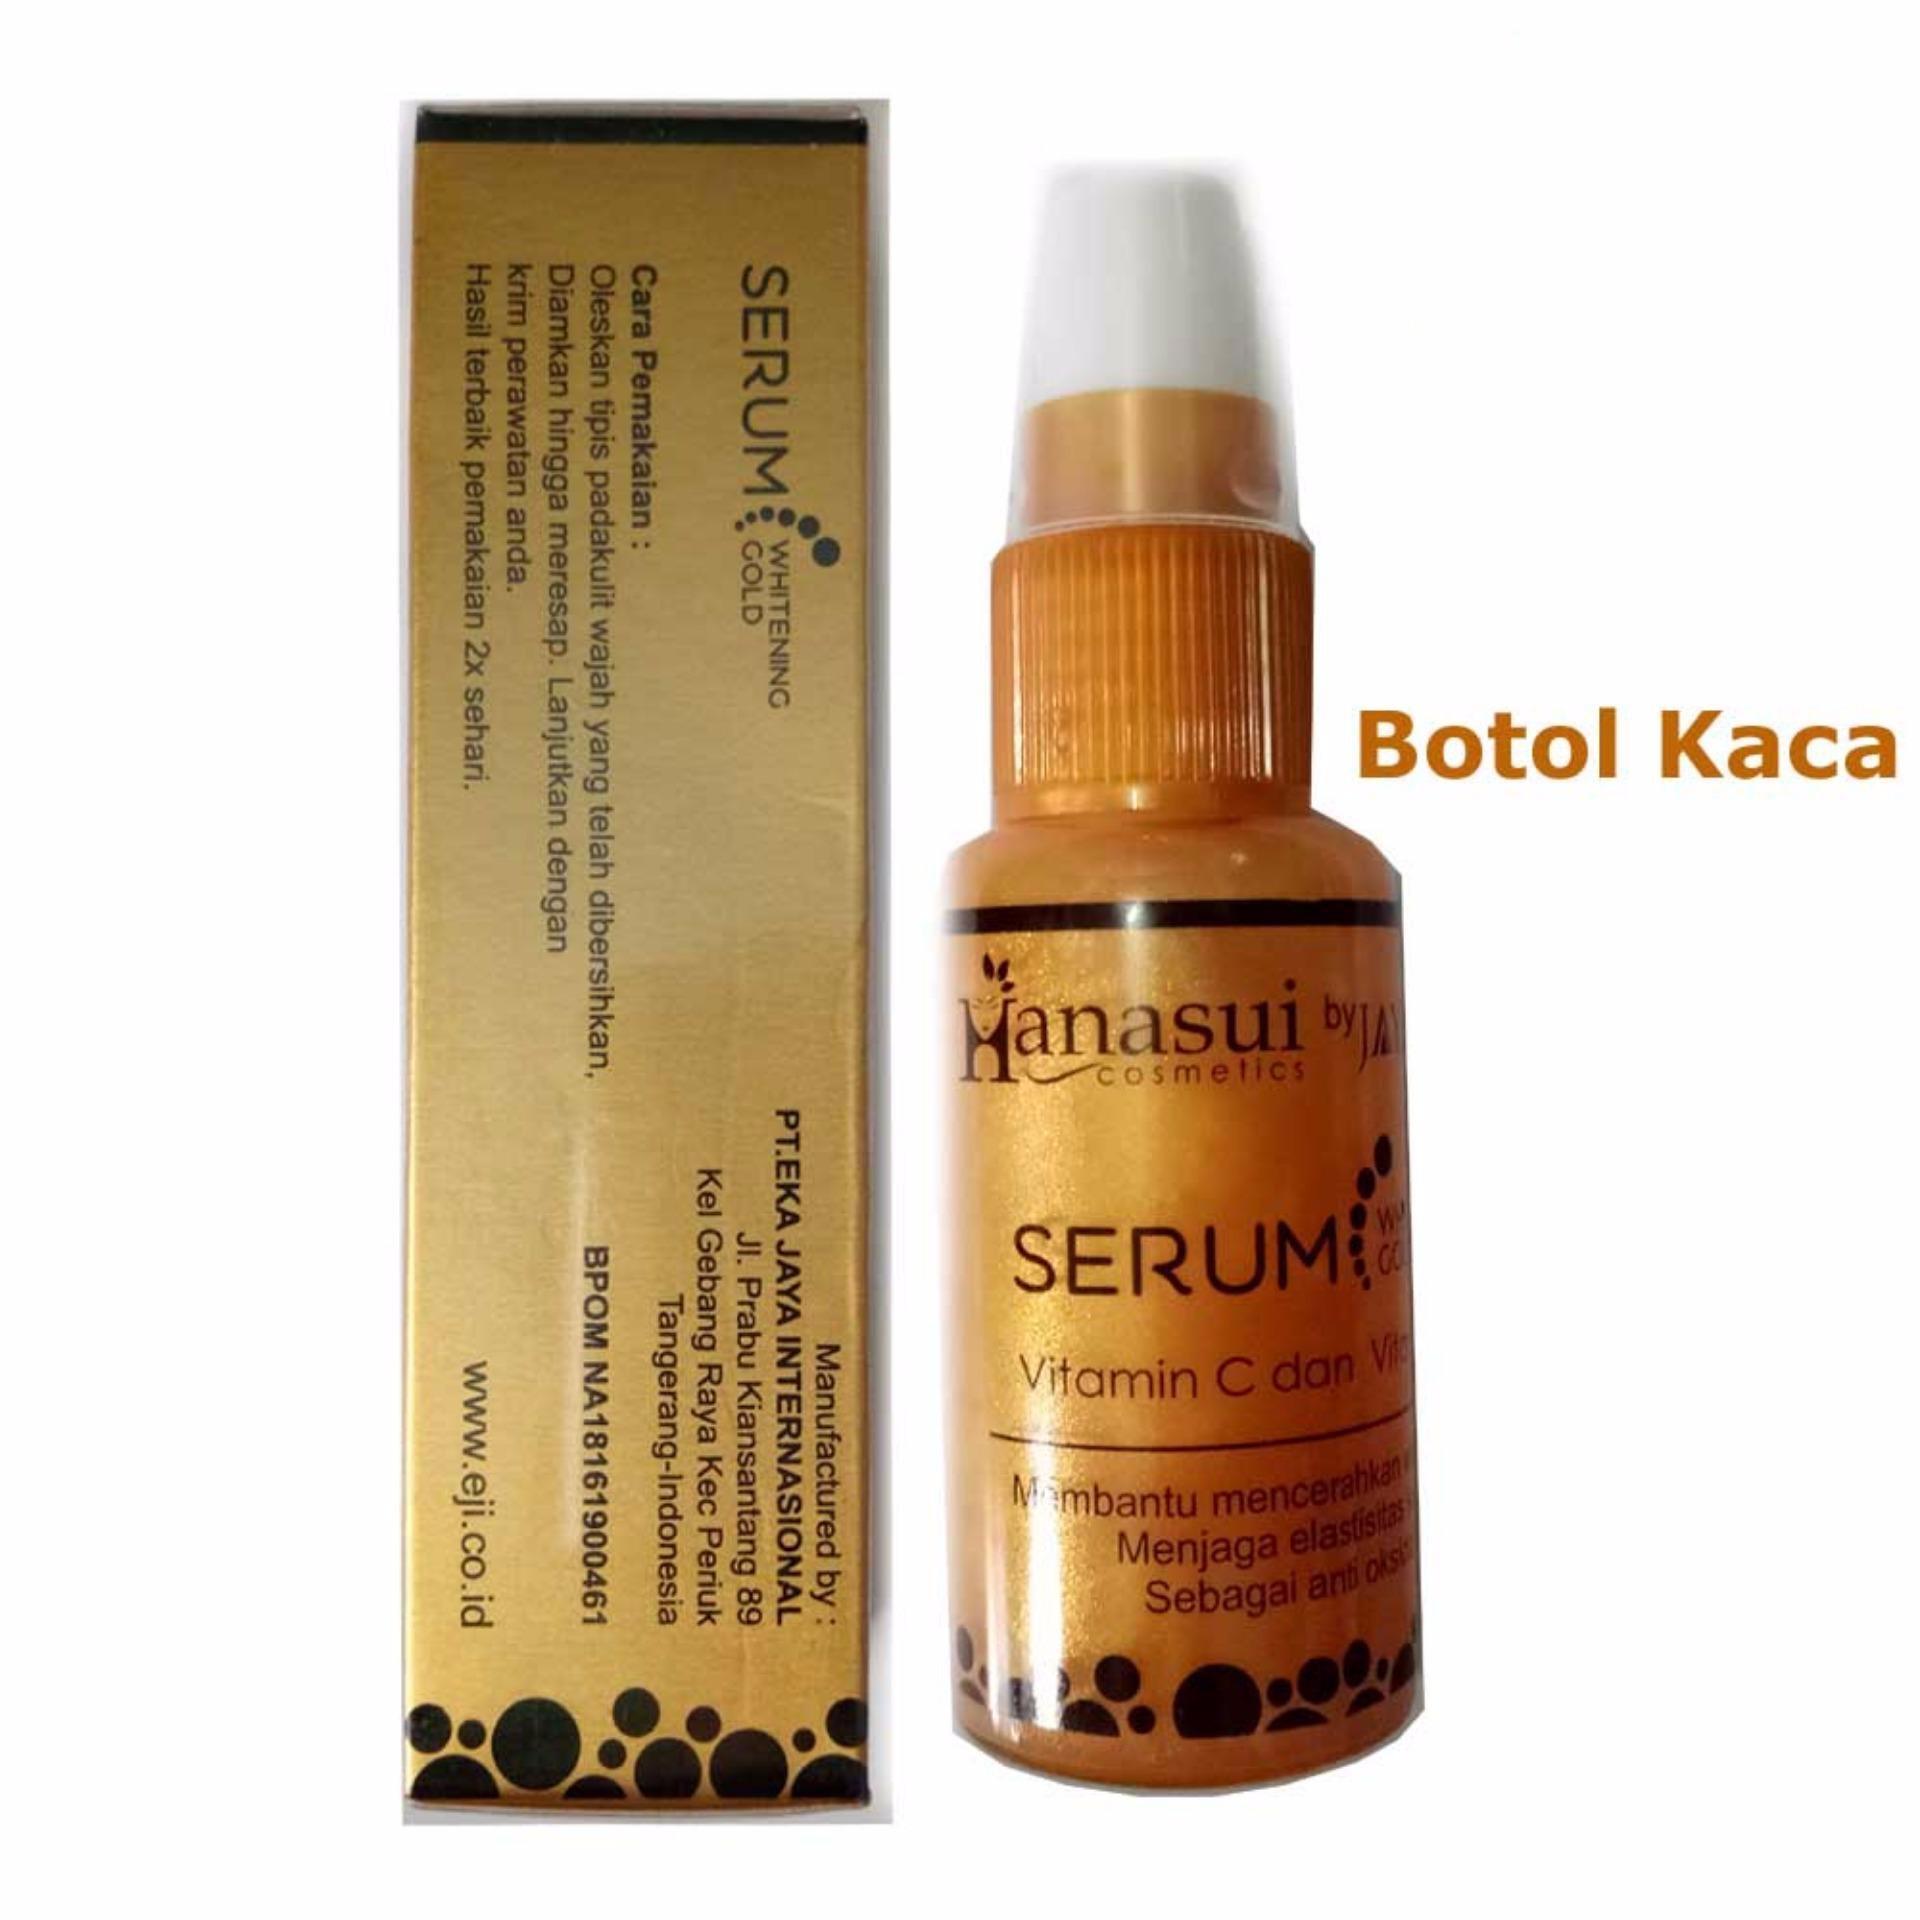 Hanasui By Jaya Mandiri Serum Whitening Gold Bpom 1 Botol Daftar Vitamin C Orange Flash Sale